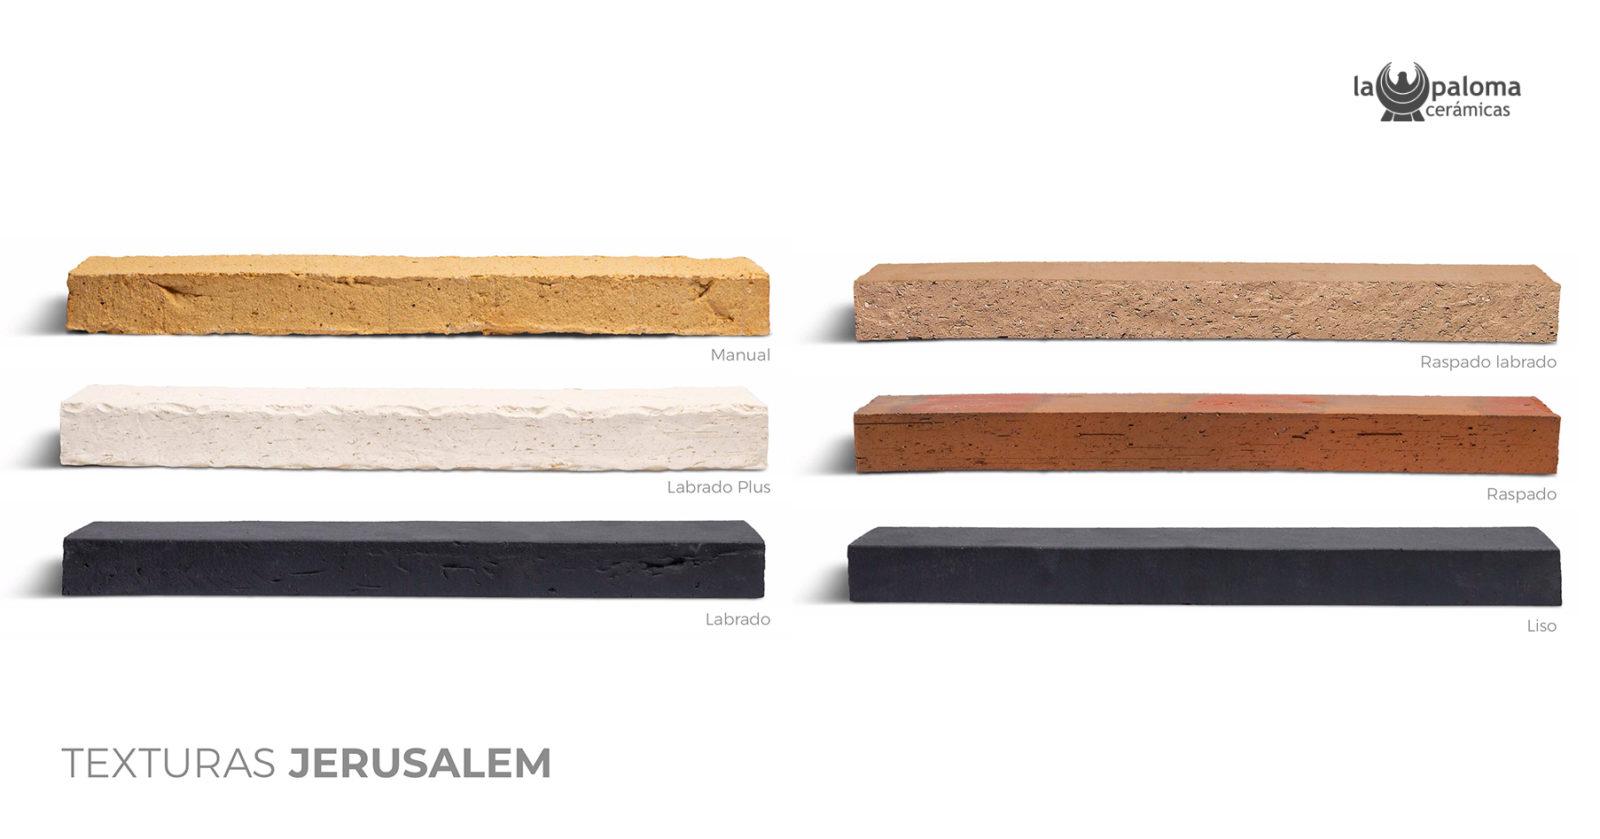 Jerusalem Line, la gama de ladrillos artesanales de alta calidad